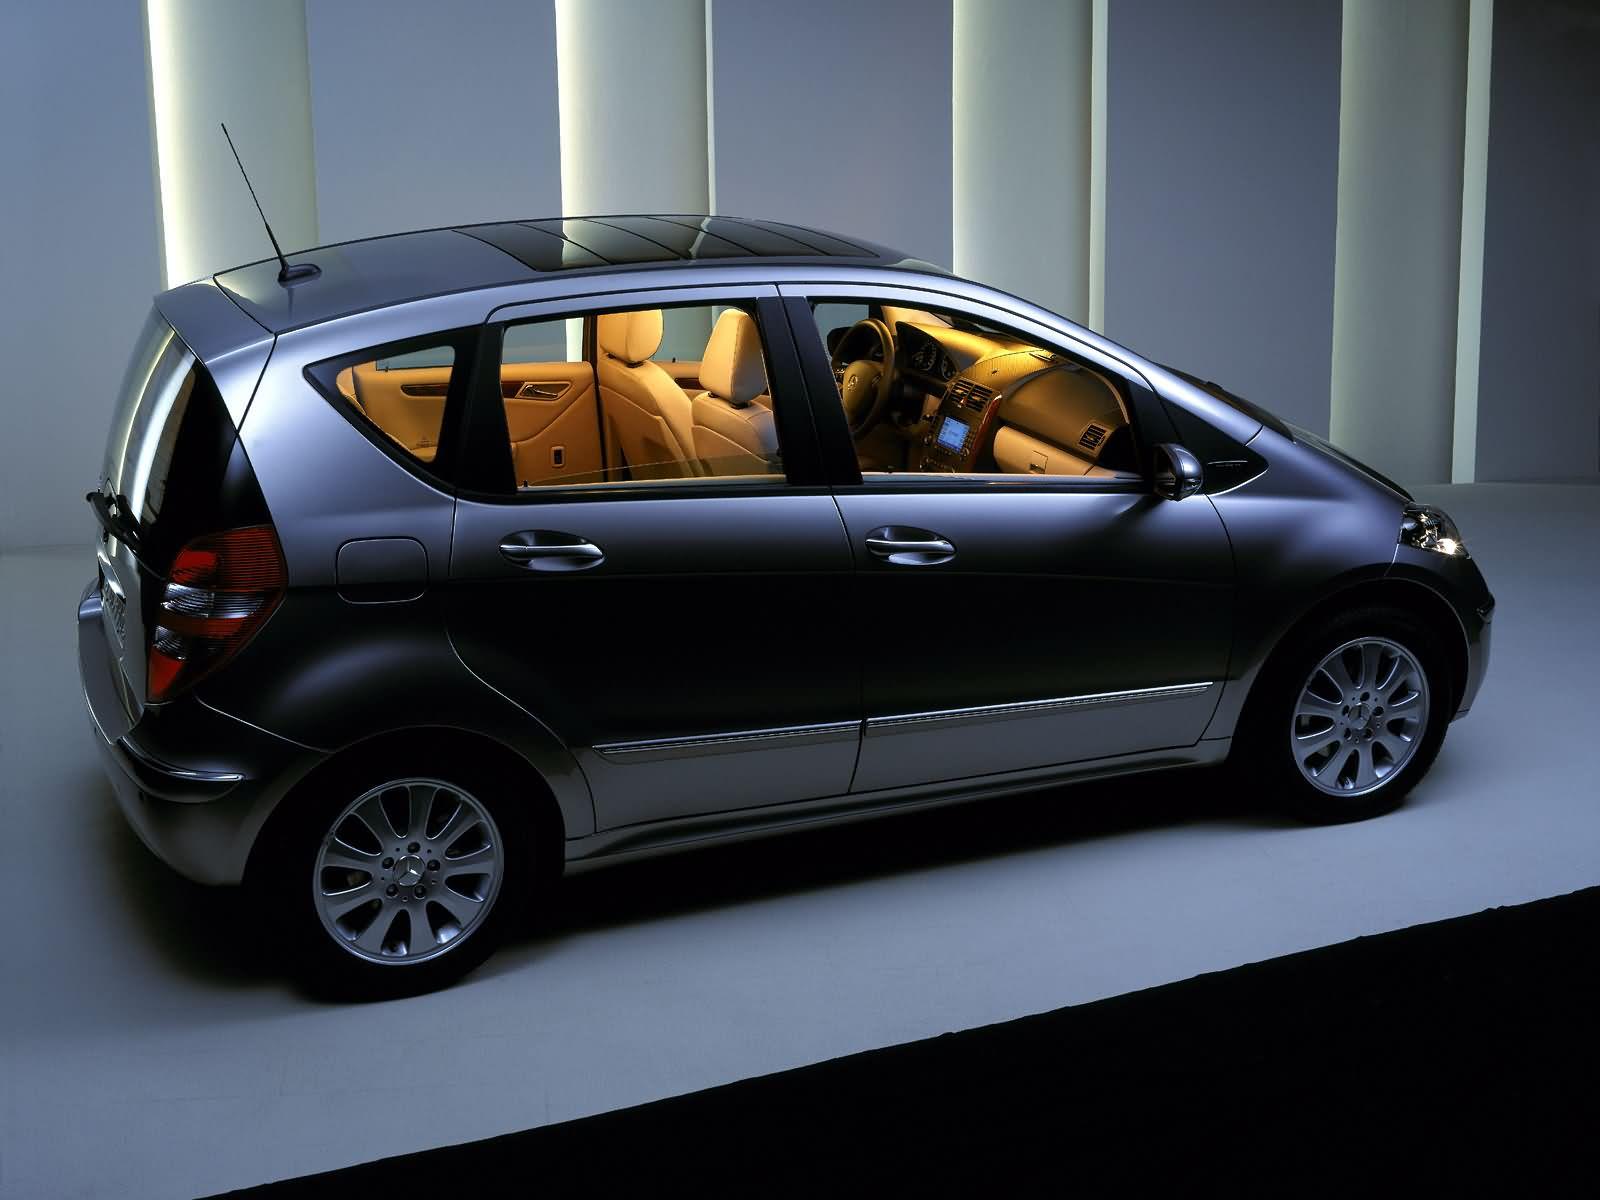 Mercedes benz a200 picture 11973 mercedes benz photo for Mercedes benz a200